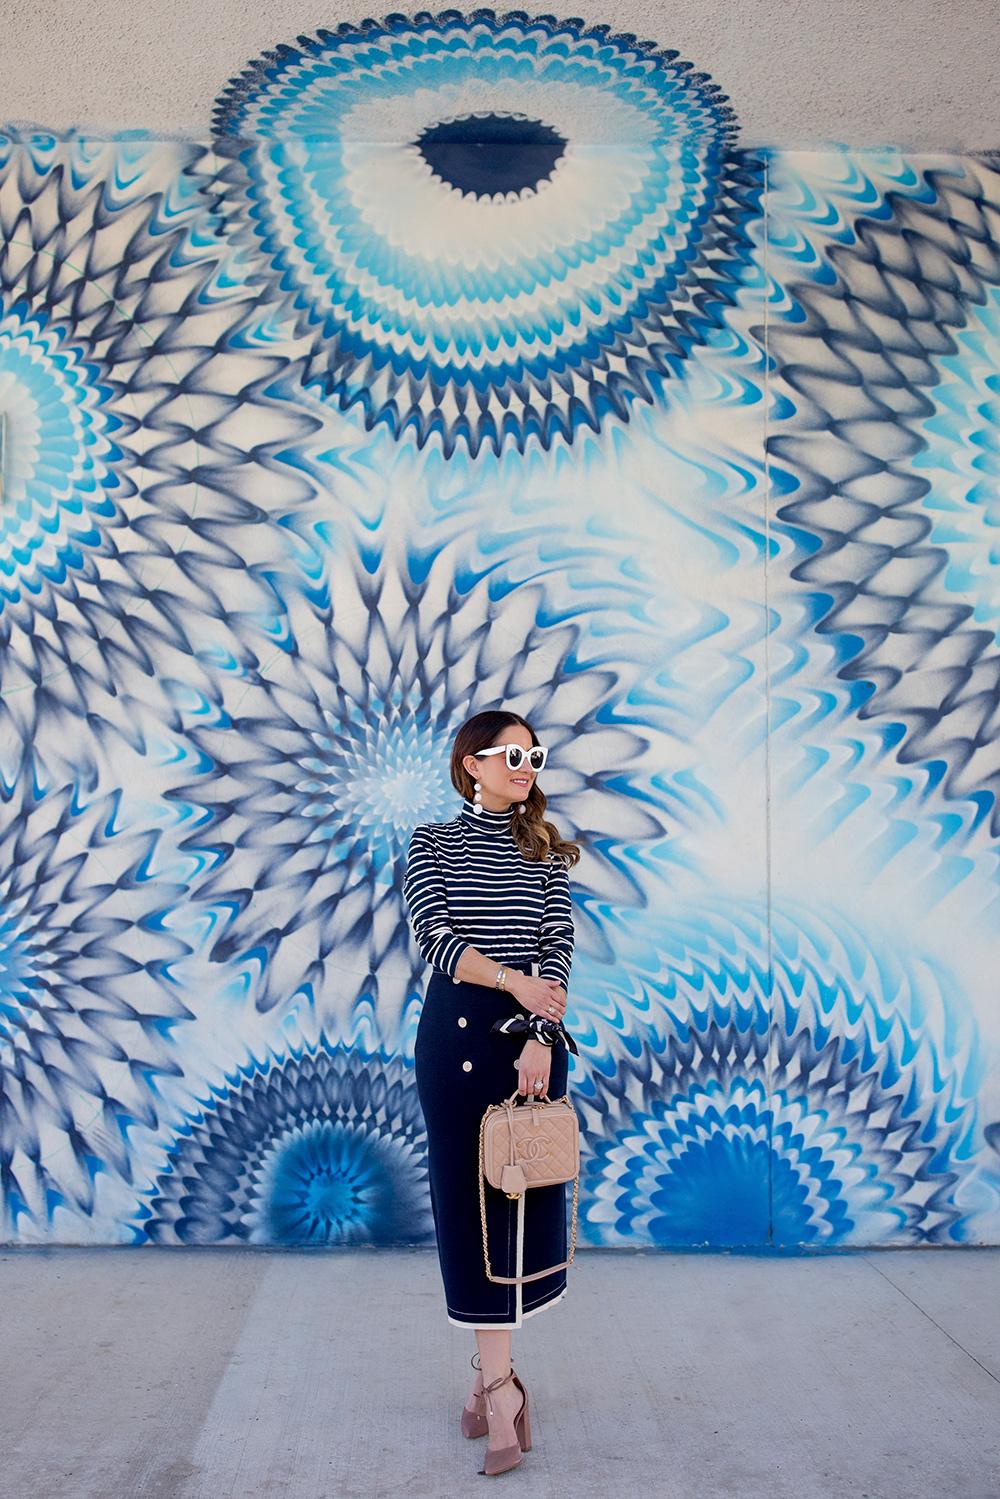 Best Colorful Murals Wynwood Miami